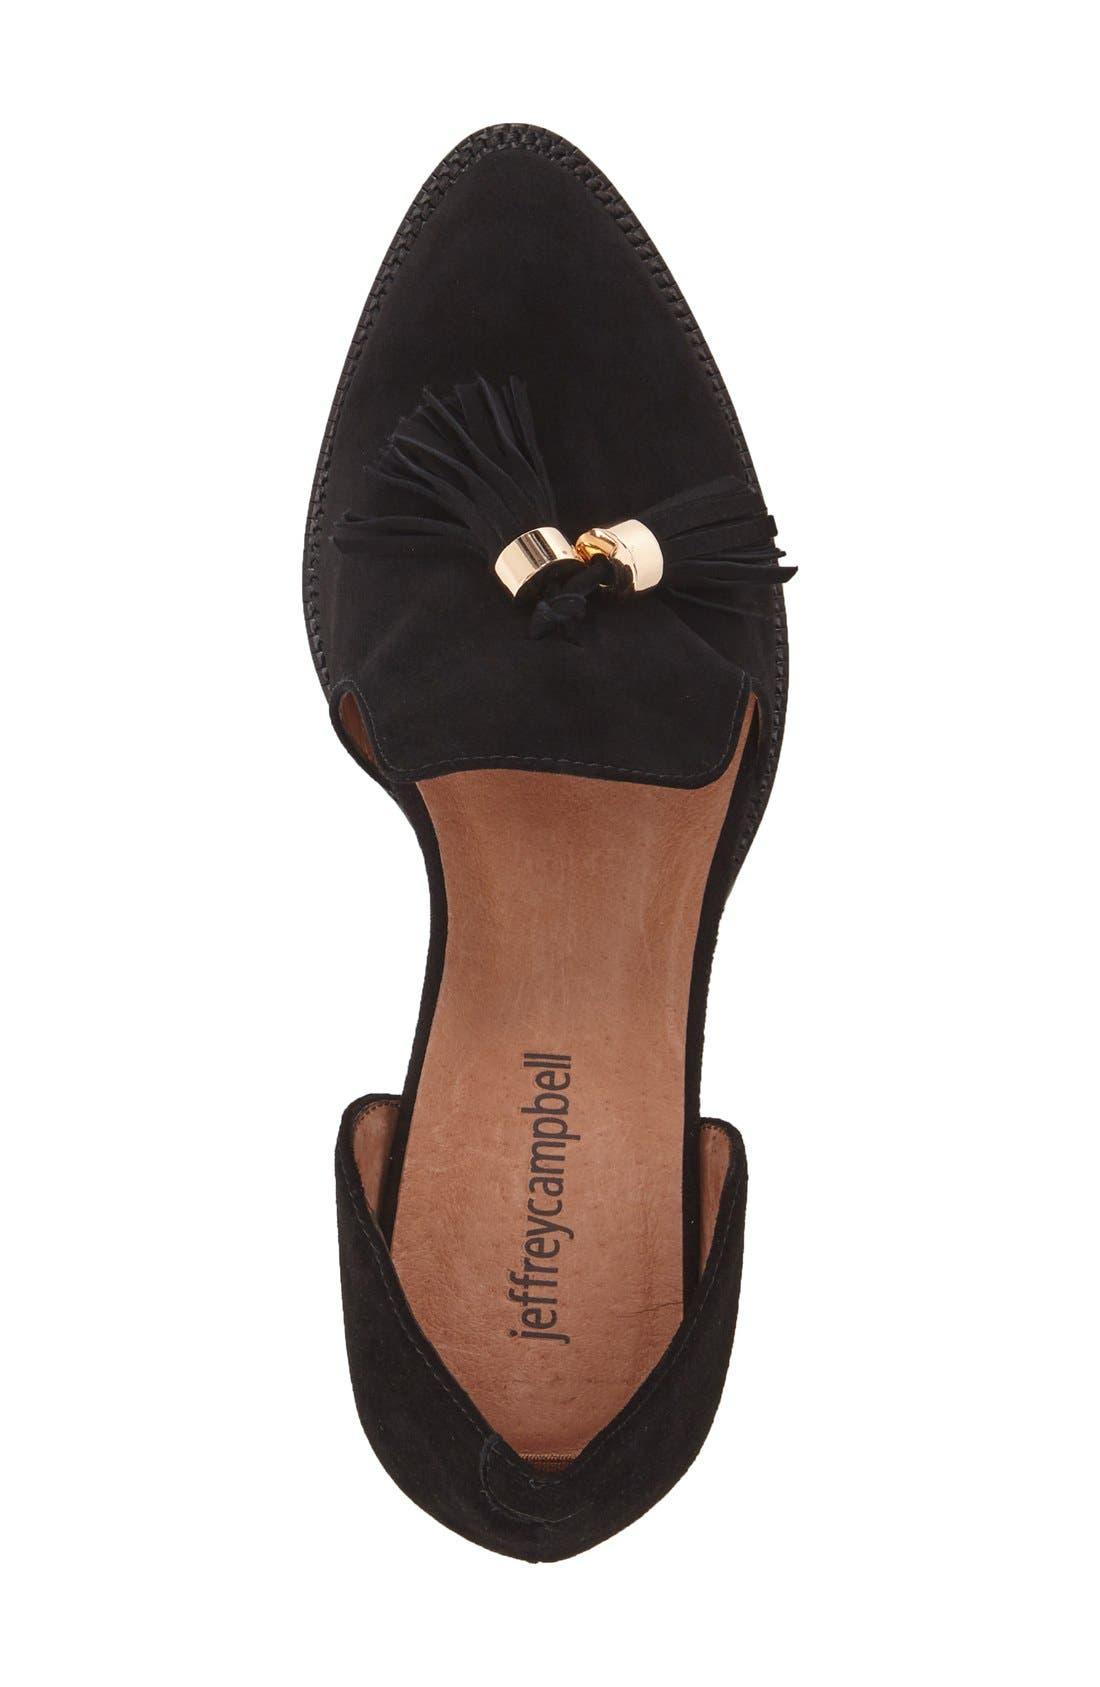 Alternate Image 3  - Jeffrey Campbell 'Civil' Pearly Heeled Beaded Tassel Loafer (Women)